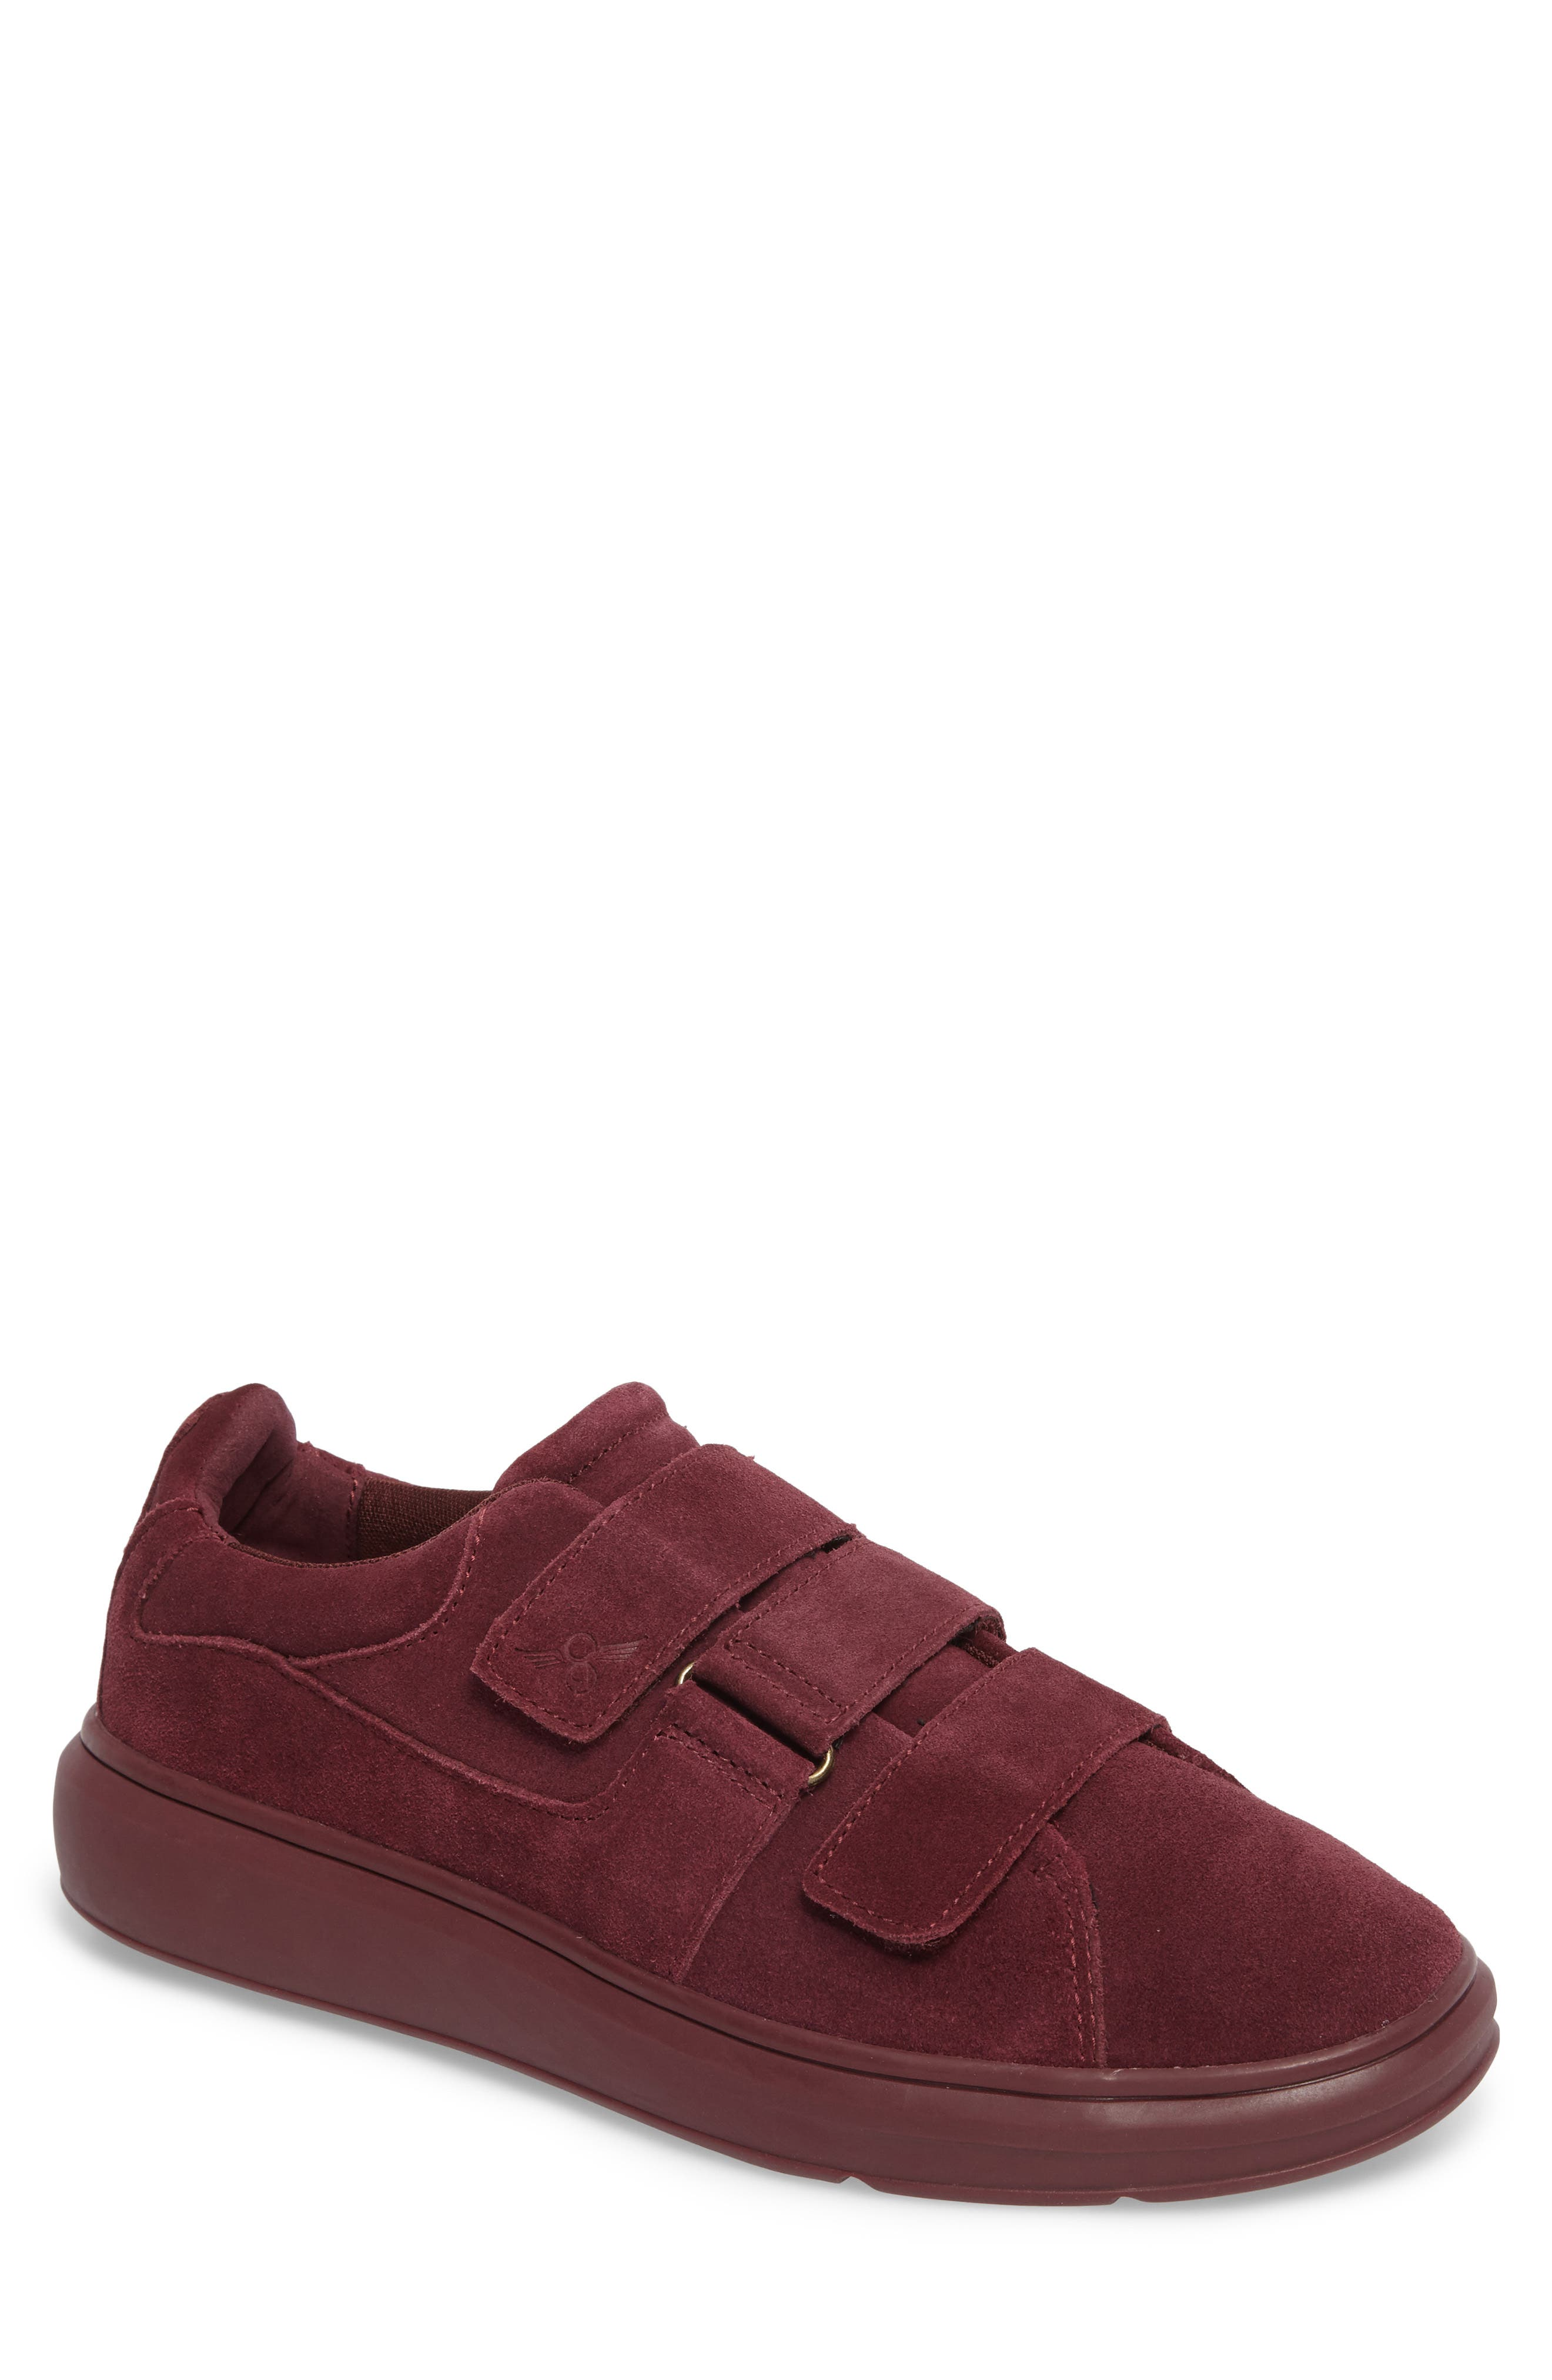 Meleti Sneaker,                         Main,                         color, Dark Burgundy Leather